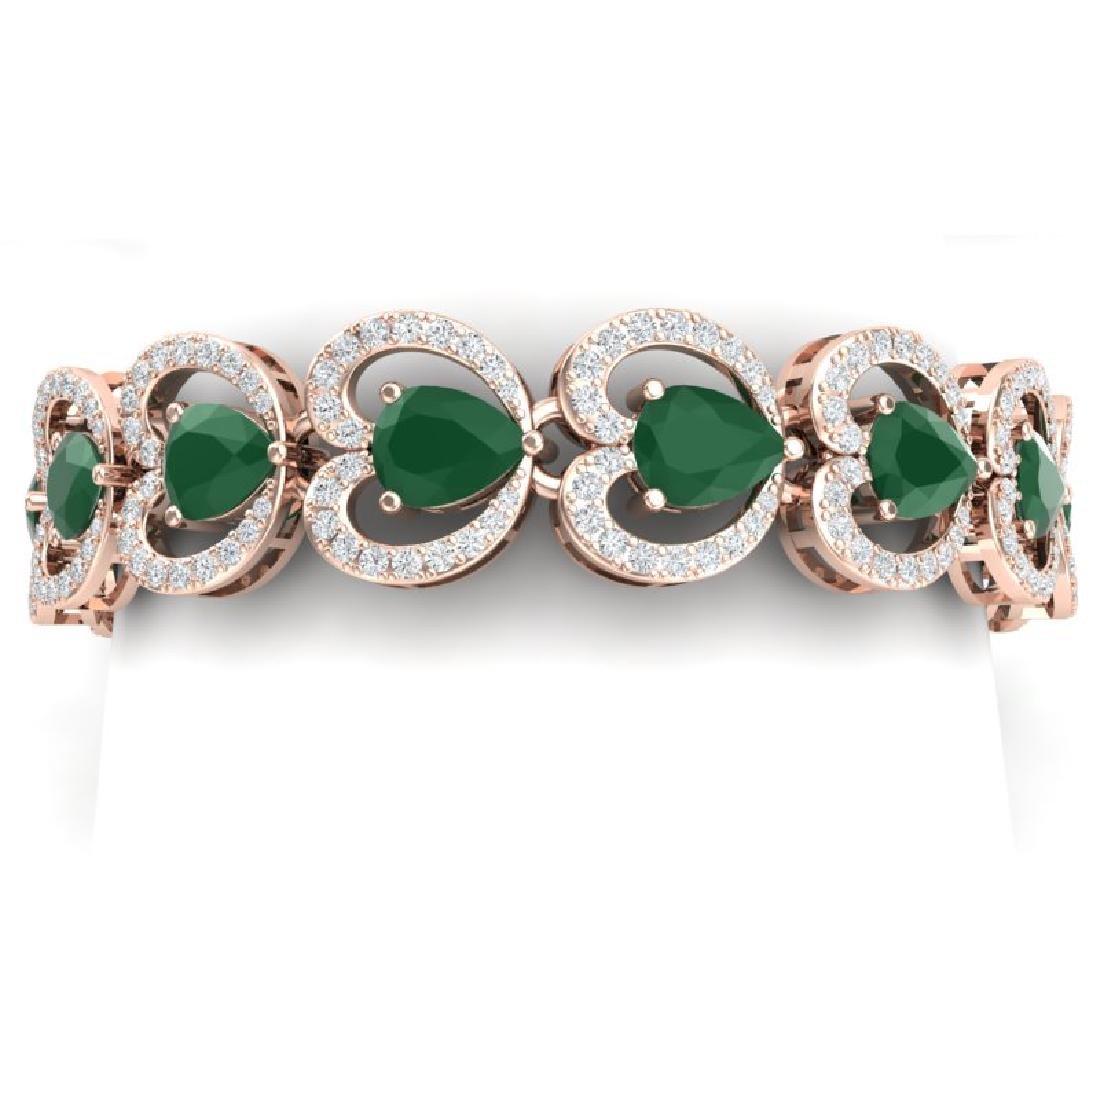 32.15 CTW Royalty Emerald & VS Diamond Bracelet 18K